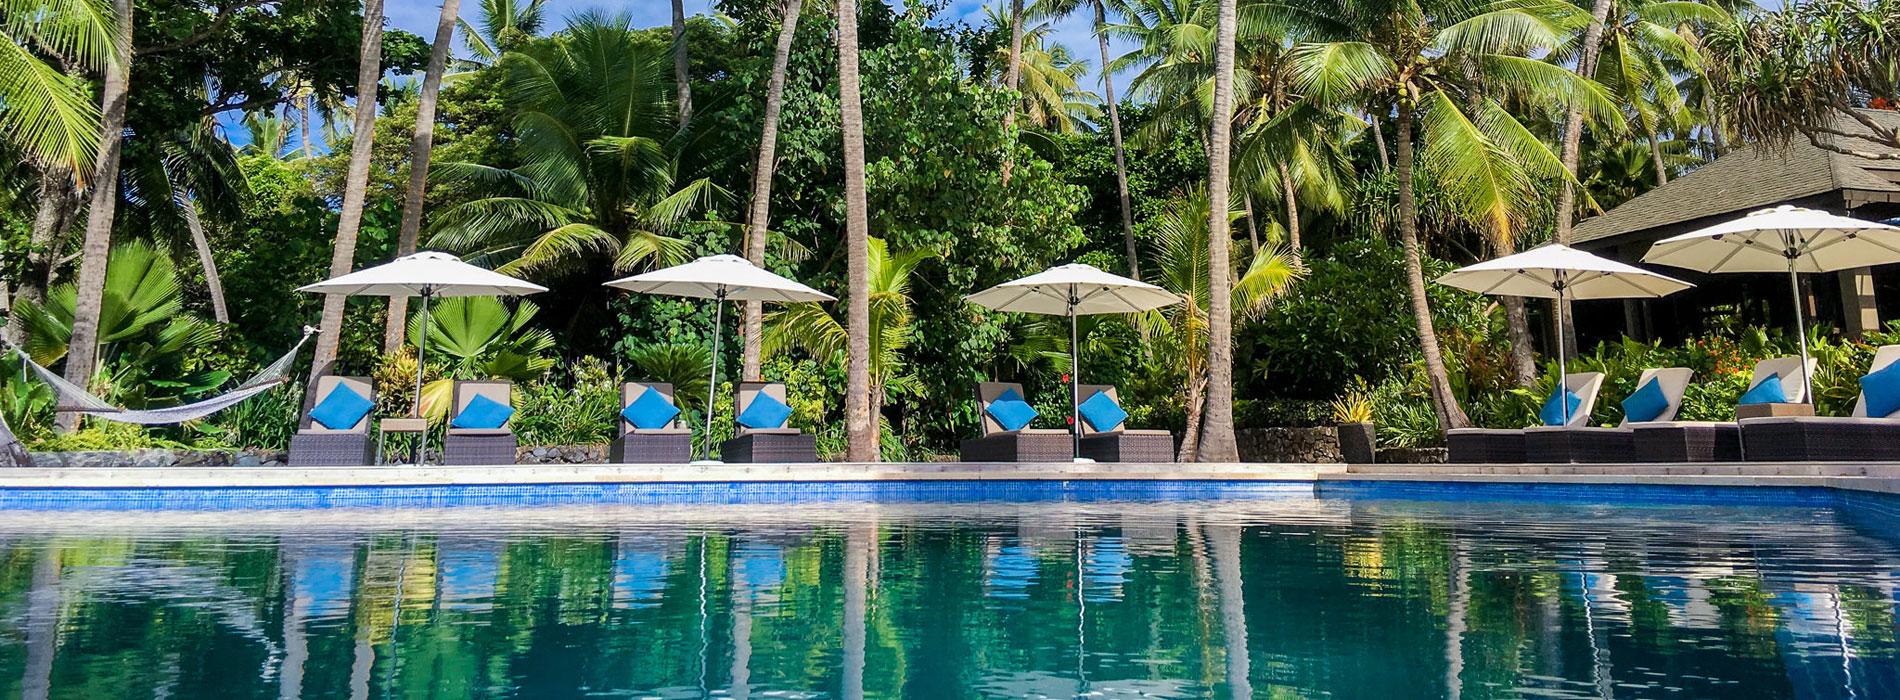 yasawa island resort fiji packages 2020